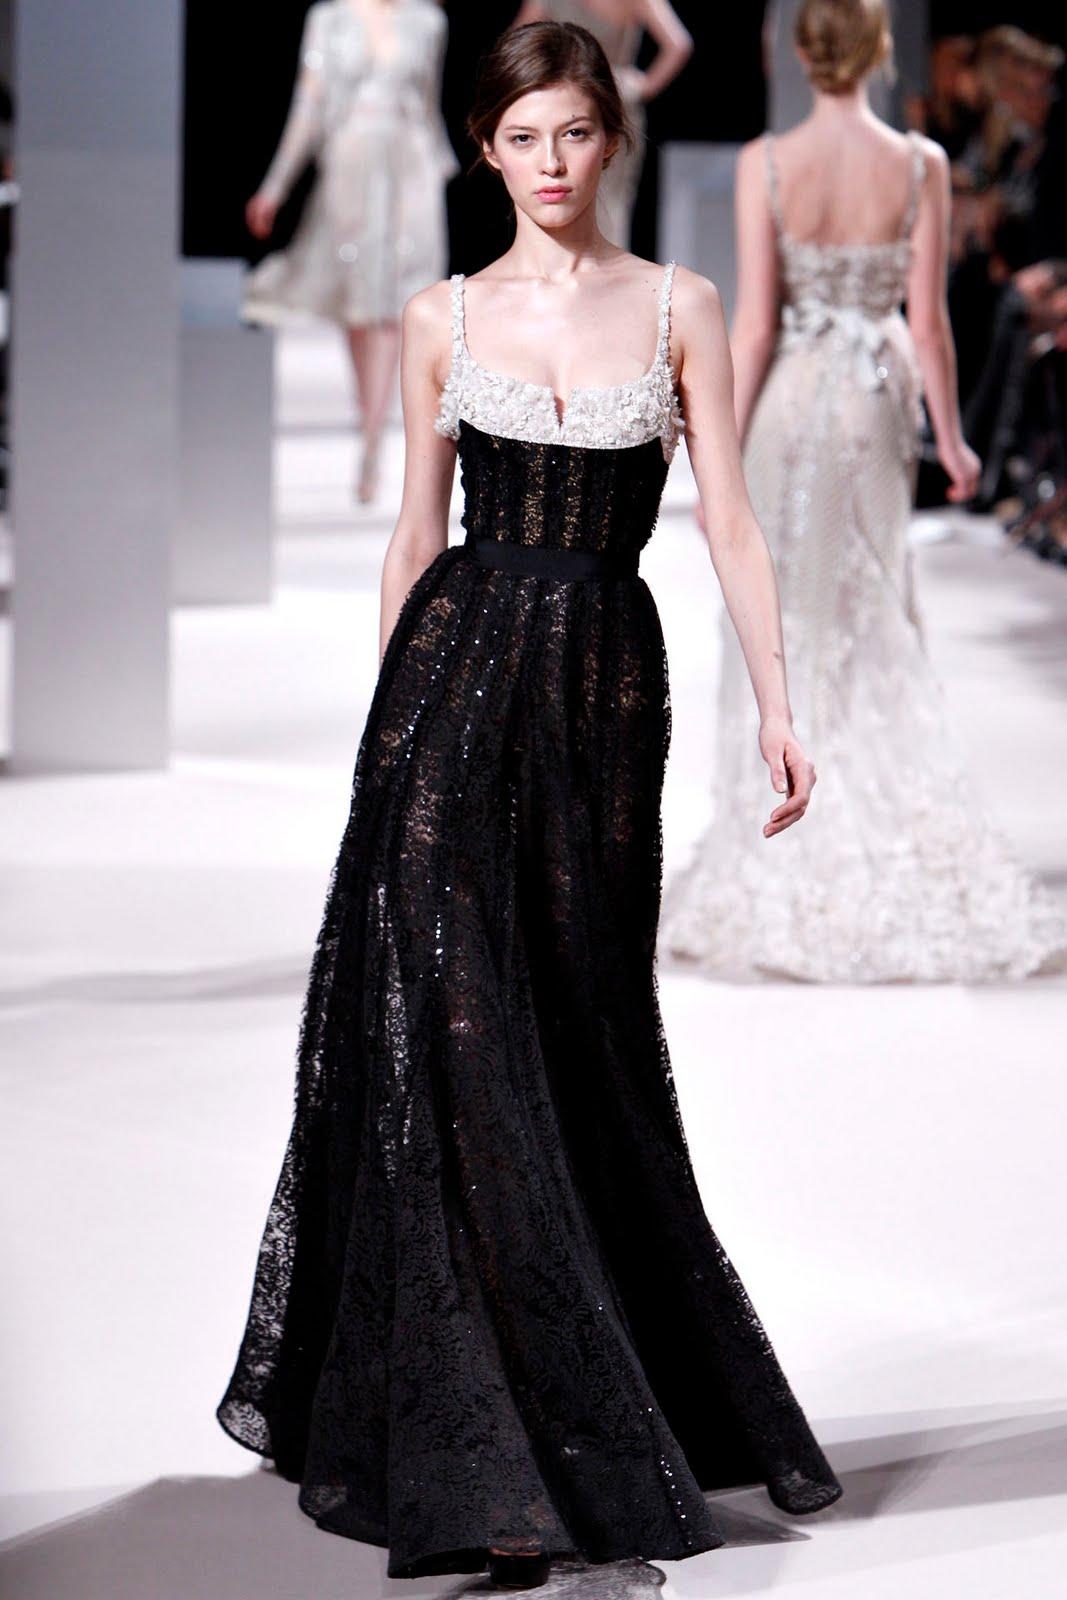 http://1.bp.blogspot.com/-_NOHGWEa4C4/TiQOTywLkHI/AAAAAAAADDM/gskWCfdOMeQ/s1600/Paris+Fashion+Week+-+Elie+Saab+Haute+Couture+%2528SS+2011%2529+29.jpg